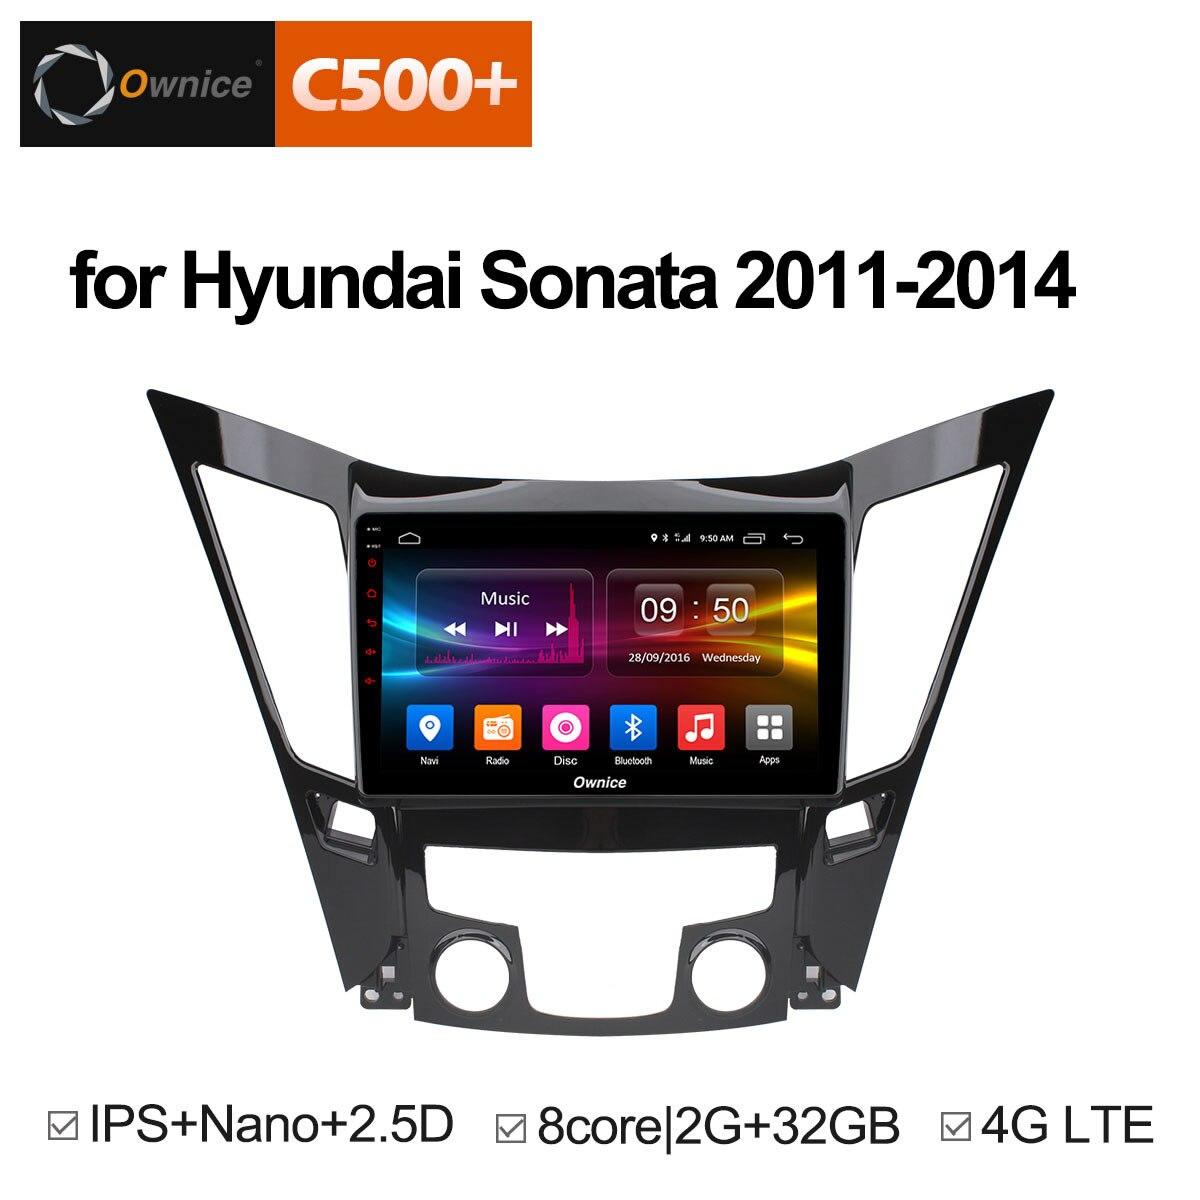 Ownice C500 + G10 Octa Core 2g + 32g Auto lettore DVD radio stereo headunit per Hyundai Sonata 2011-2014 audio android 8.1 gps navi